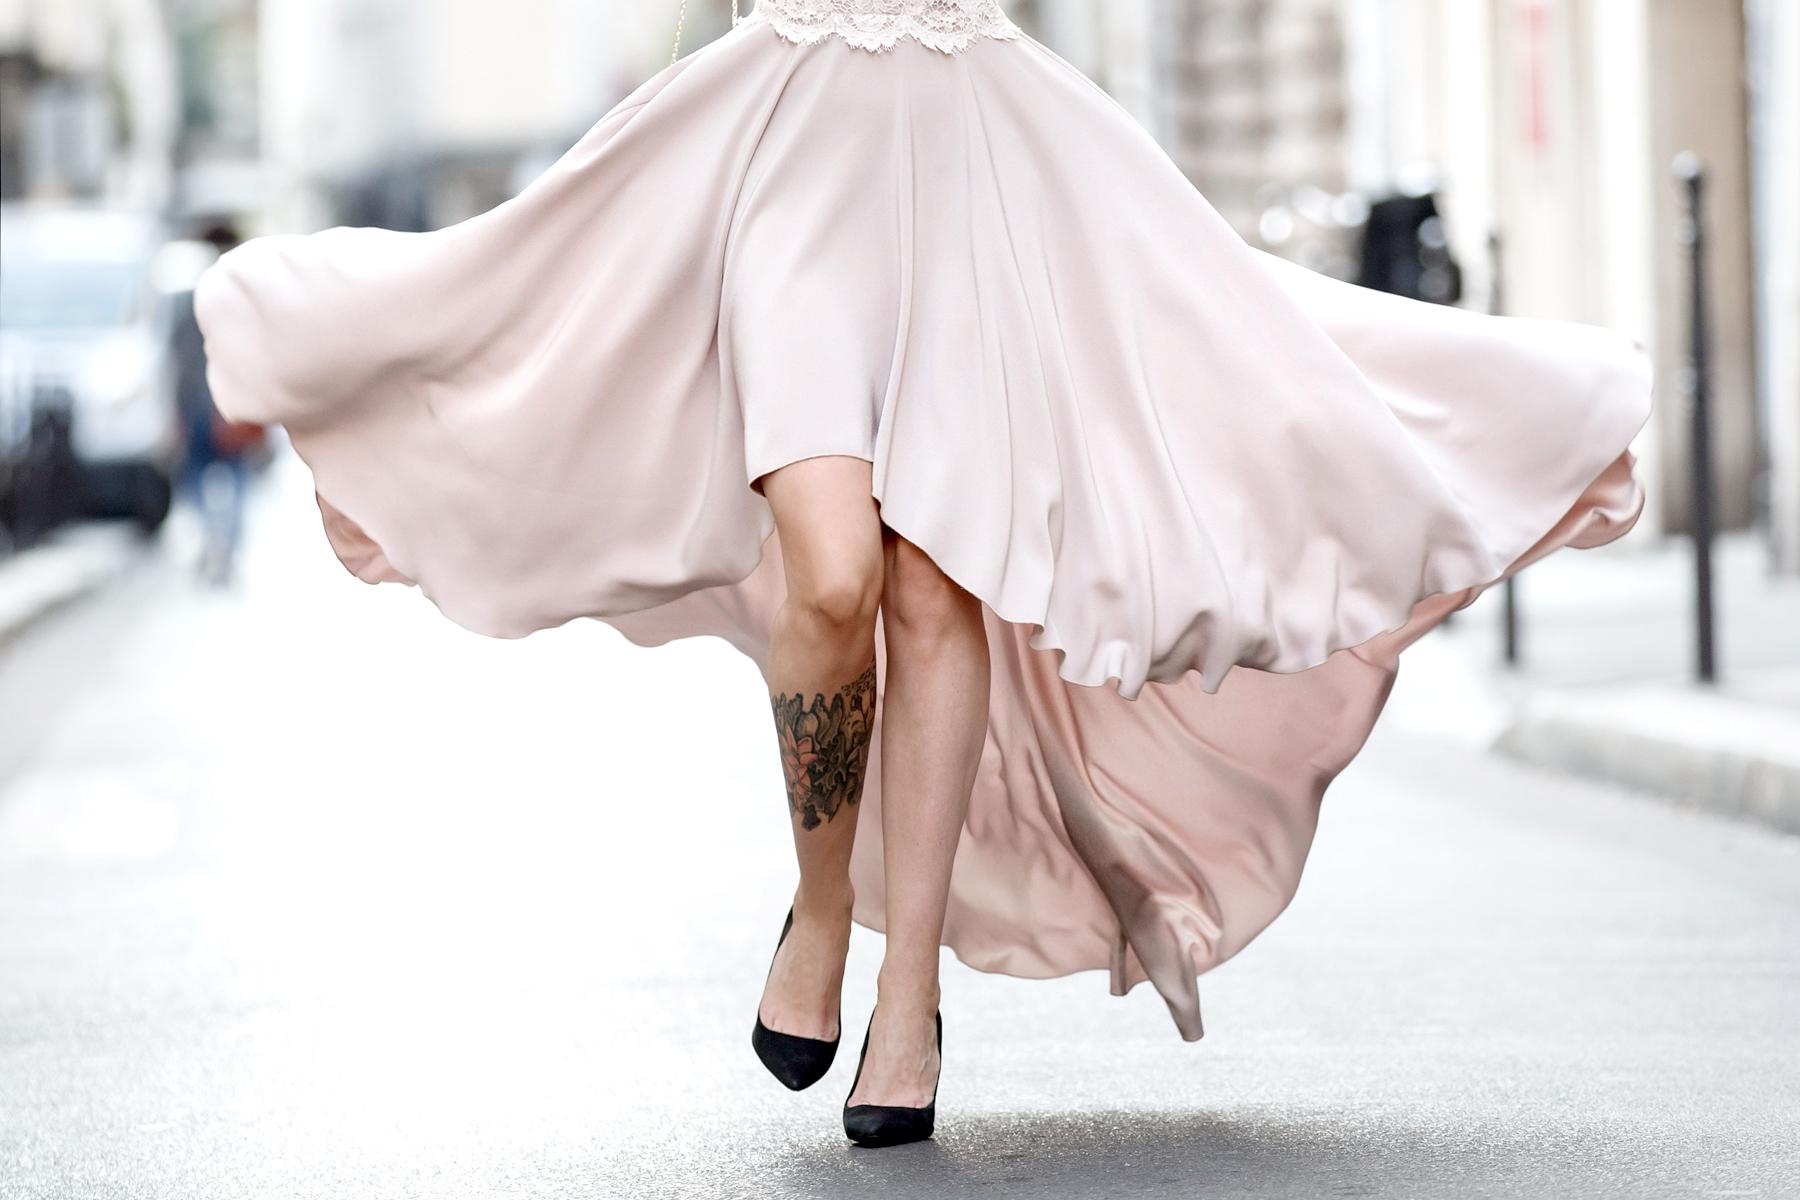 ewa herzog lace dress pastel rose paris le marais pfw fashion week ss16 ricarda schernus cats & dogs blog 5